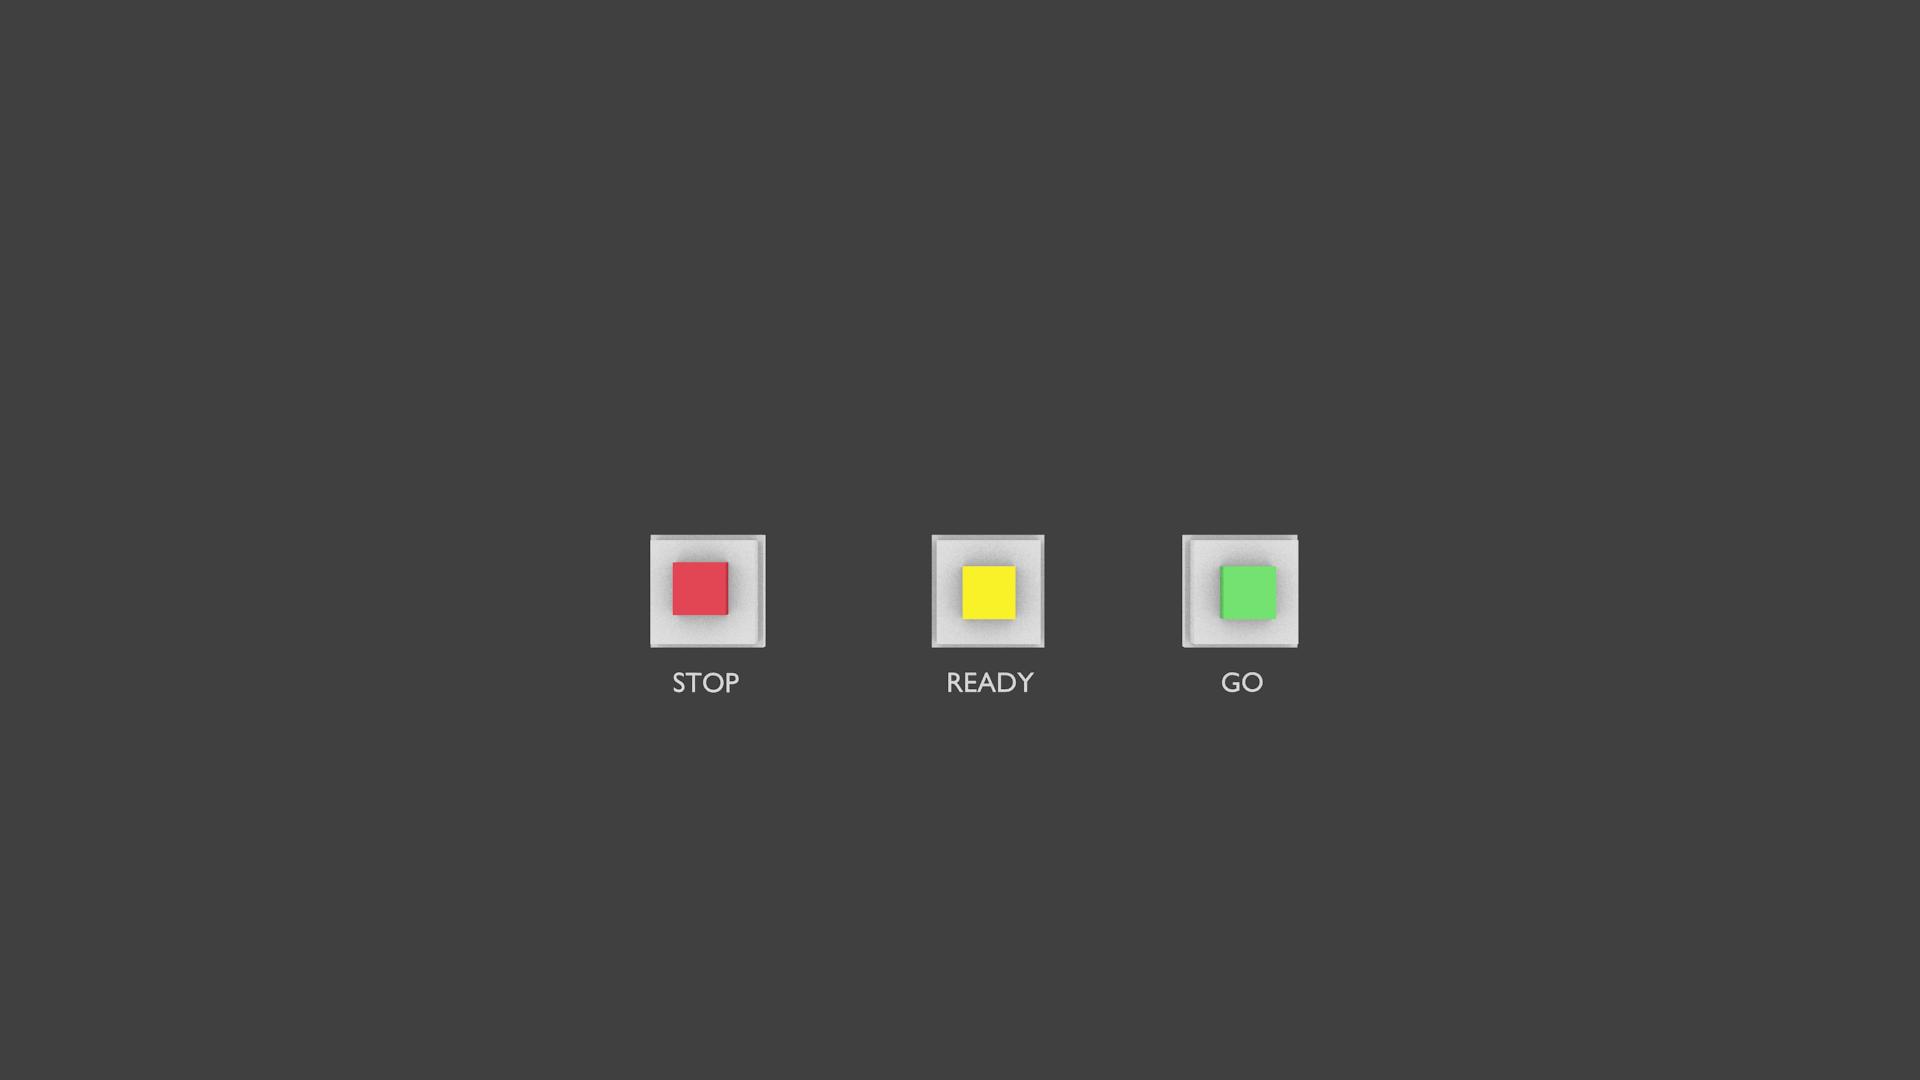 Aesthetic Minimal Desktop Wallpapers Top Free Aesthetic Minimal